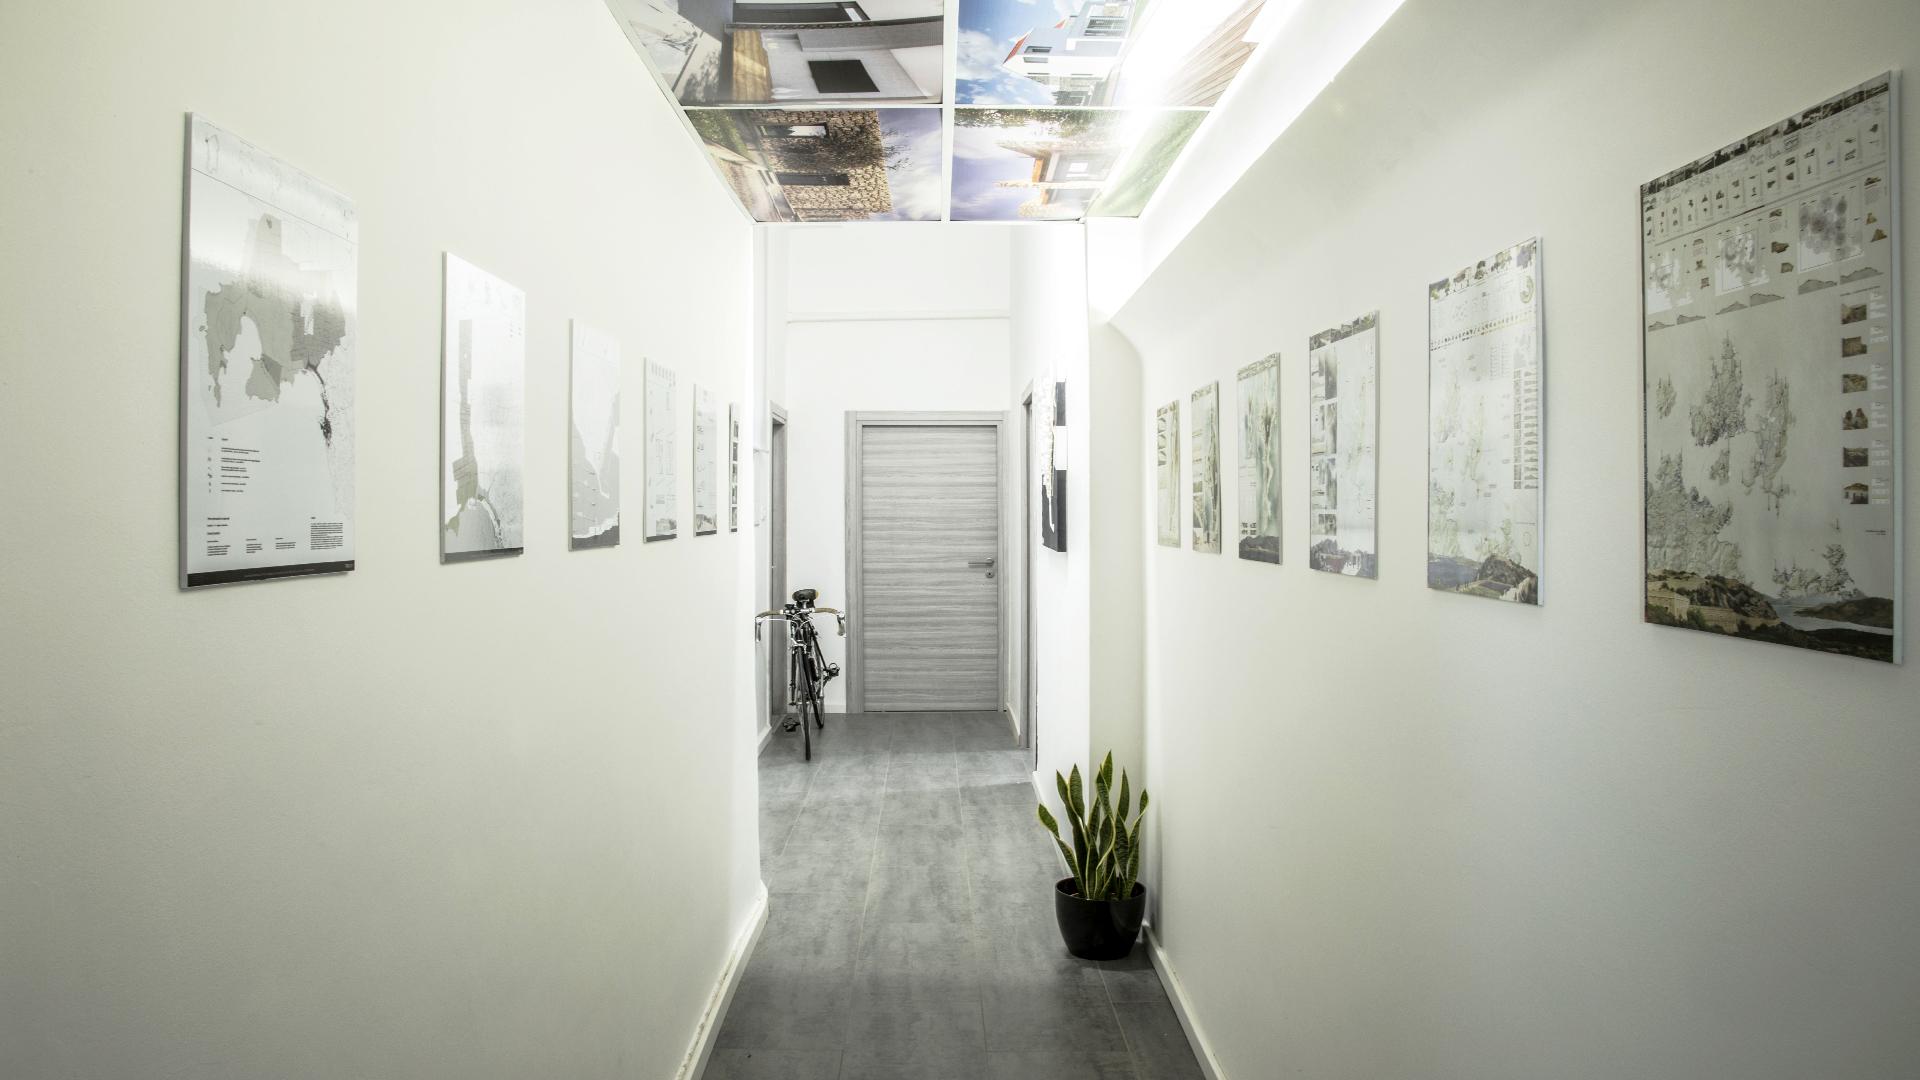 Studio architettura alghero Pixel (1)